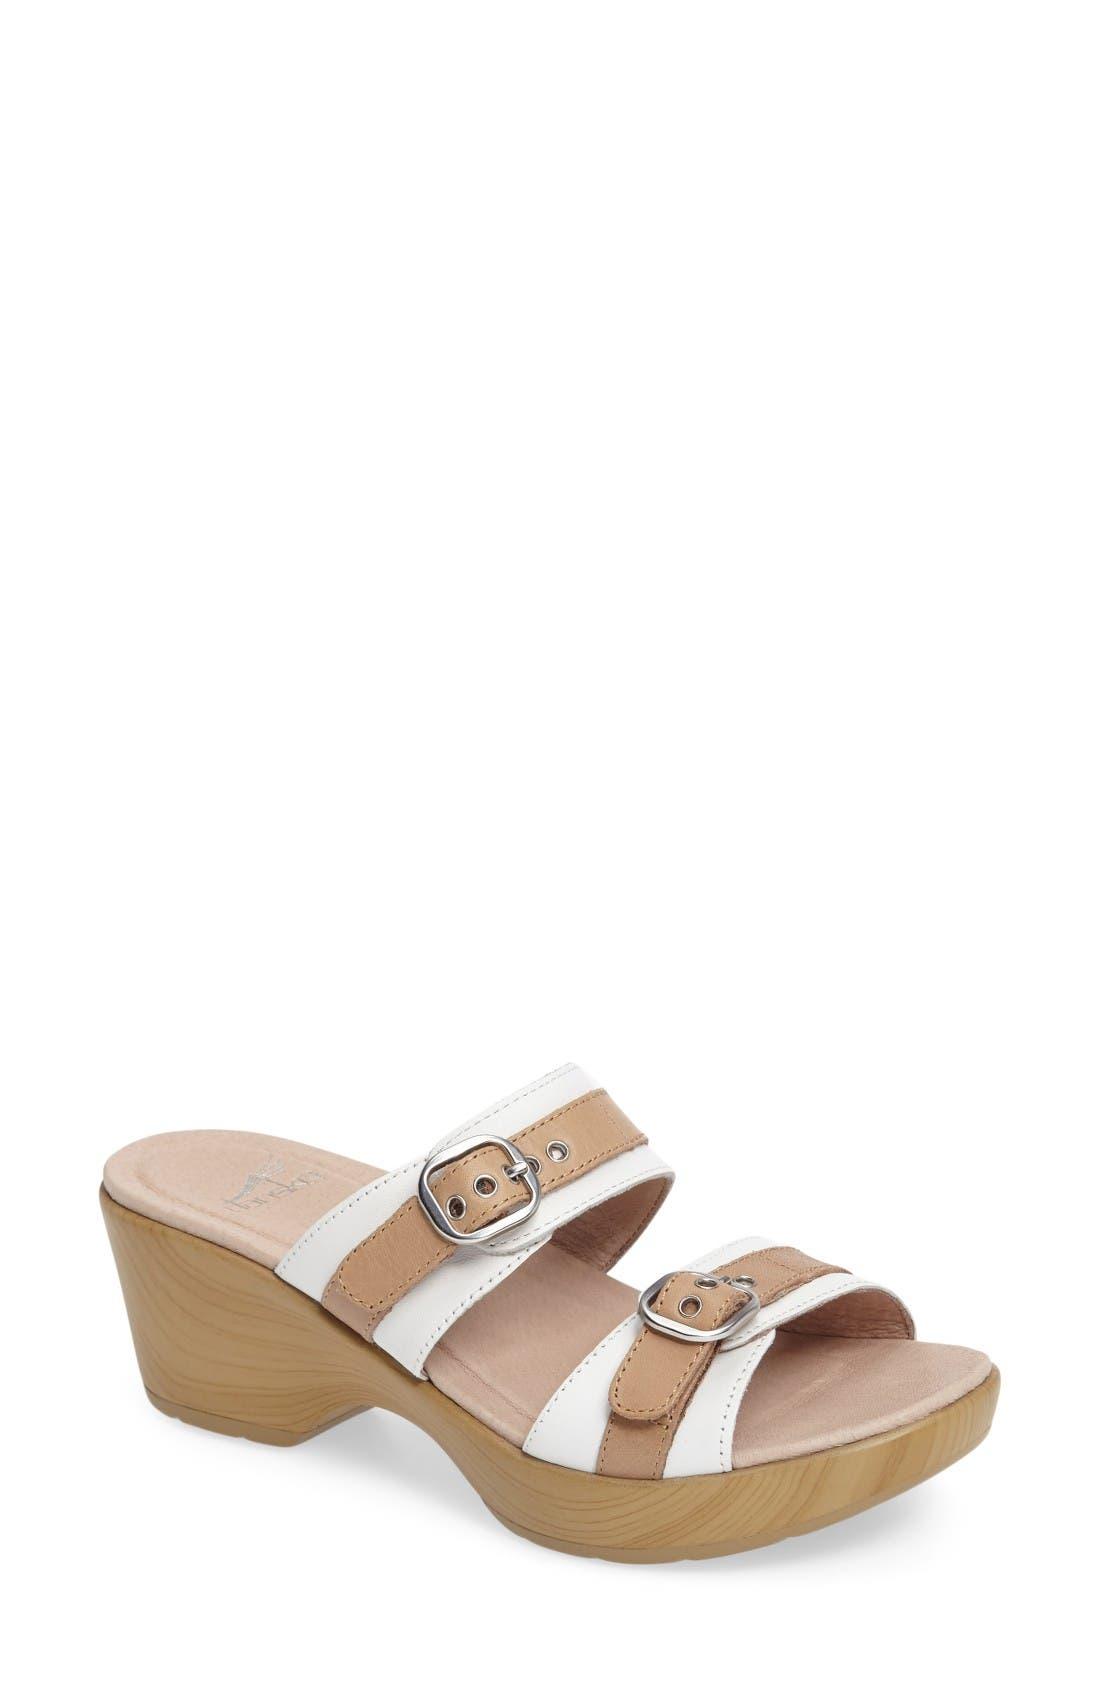 Alternate Image 1 Selected - Dansko 'Jessie' Double Strap Sandal (Women)